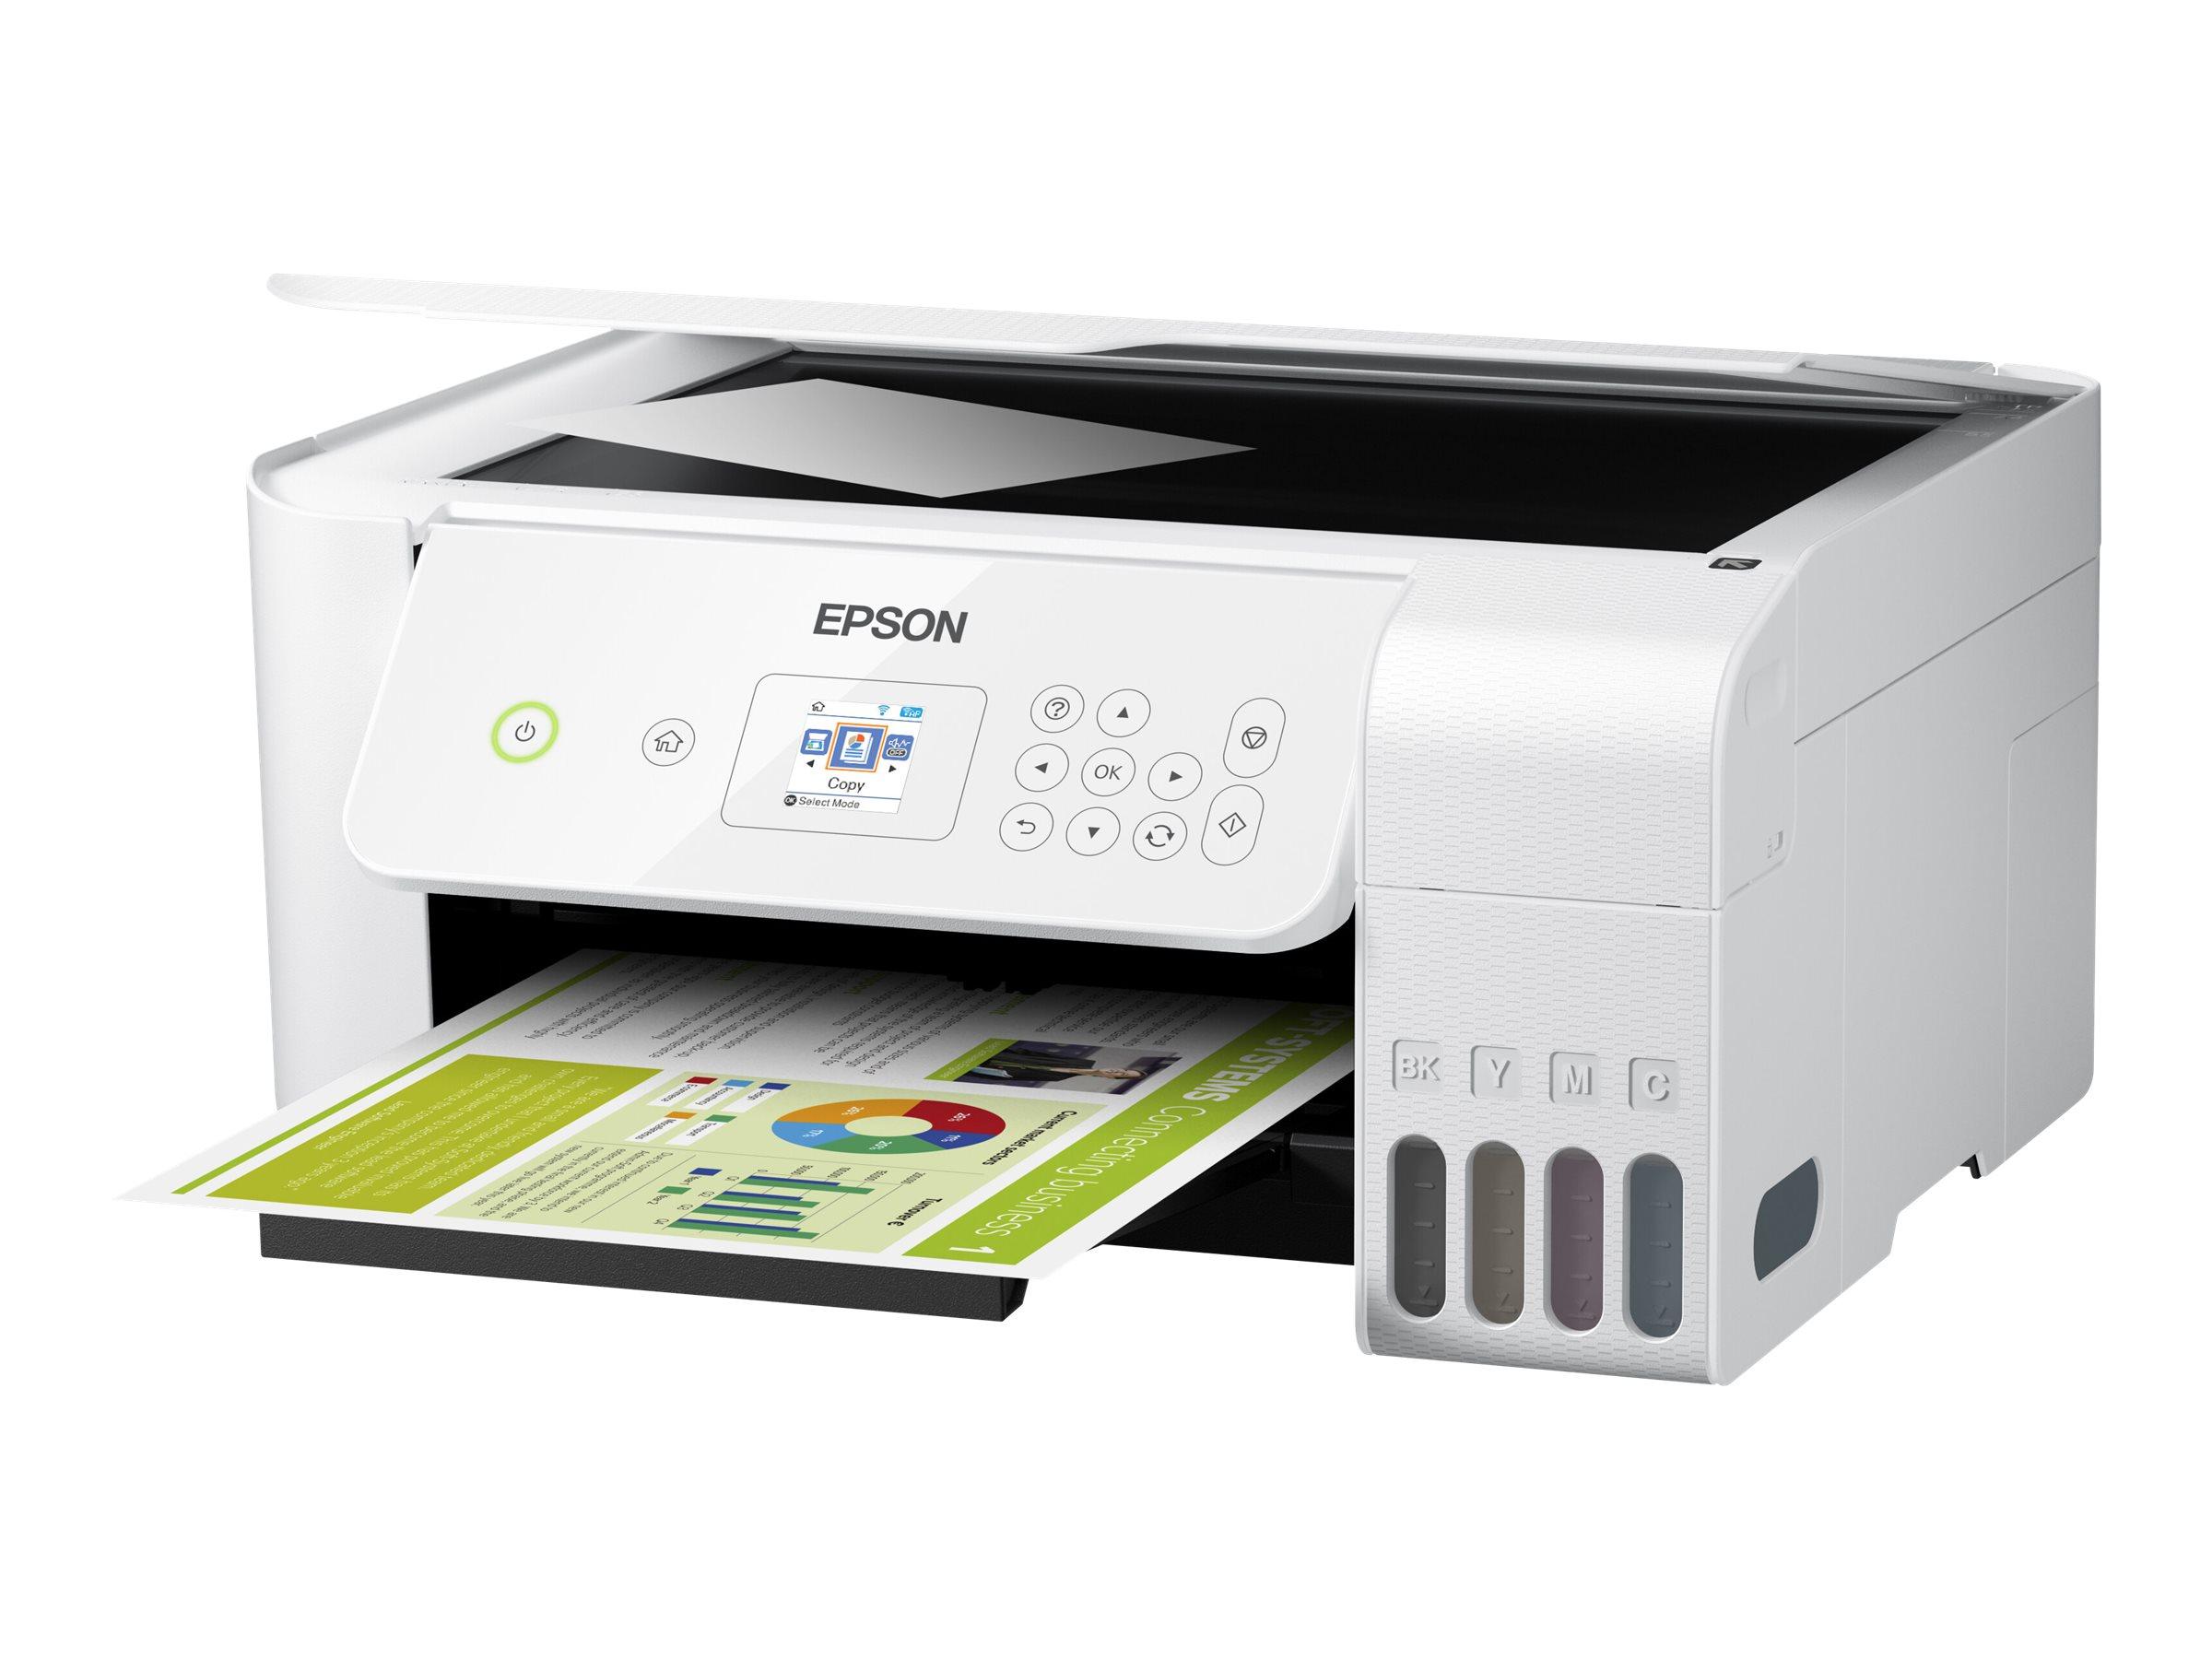 Epson EcoTank ET-2726 - Unlimited - Multifunktionsdrucker - Farbe - Tintenstrahl - refillable